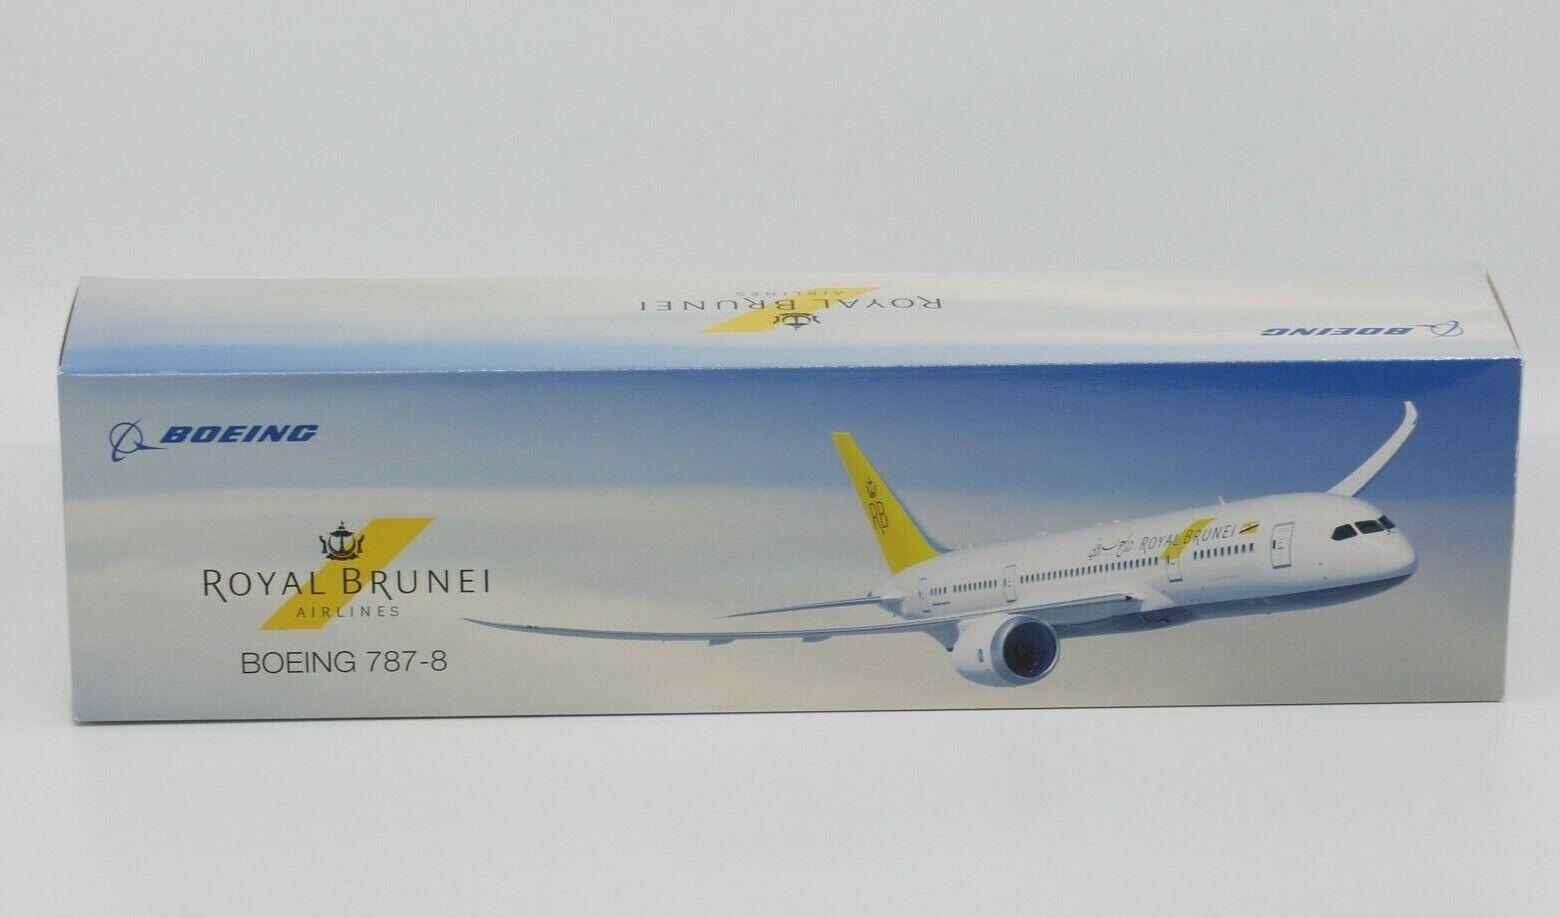 Hogan vinges A165GRMU, Boeing 787 -8, Royal Brunei Airlines, 1 200